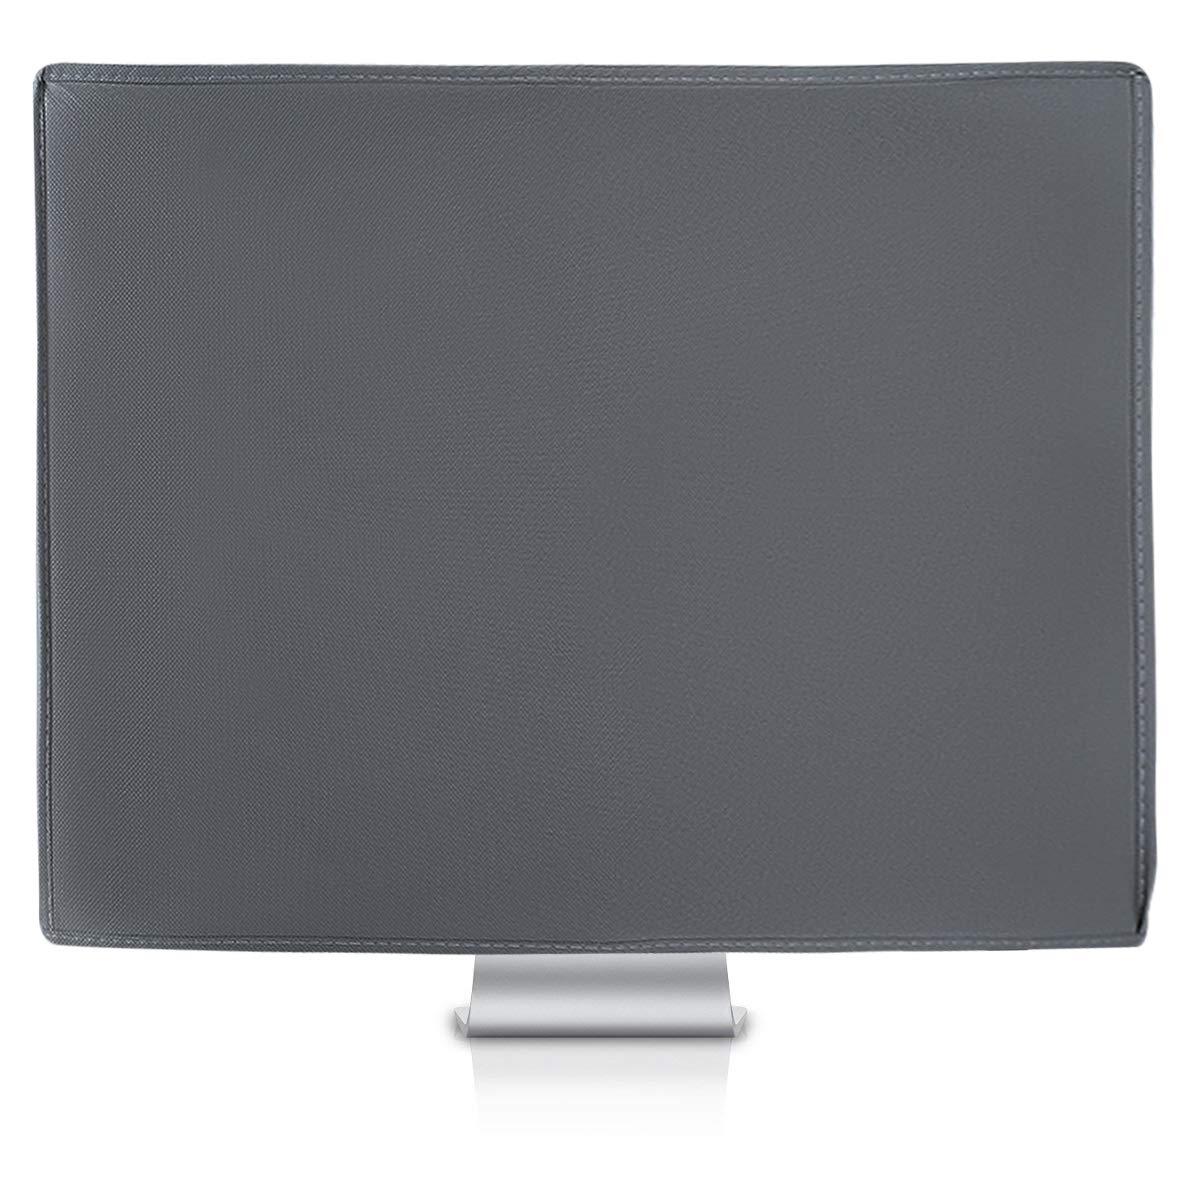 MOSISO Monitor Polvo Funda 26, 27, 28, 29 Pulgadas Panel de LCD ...